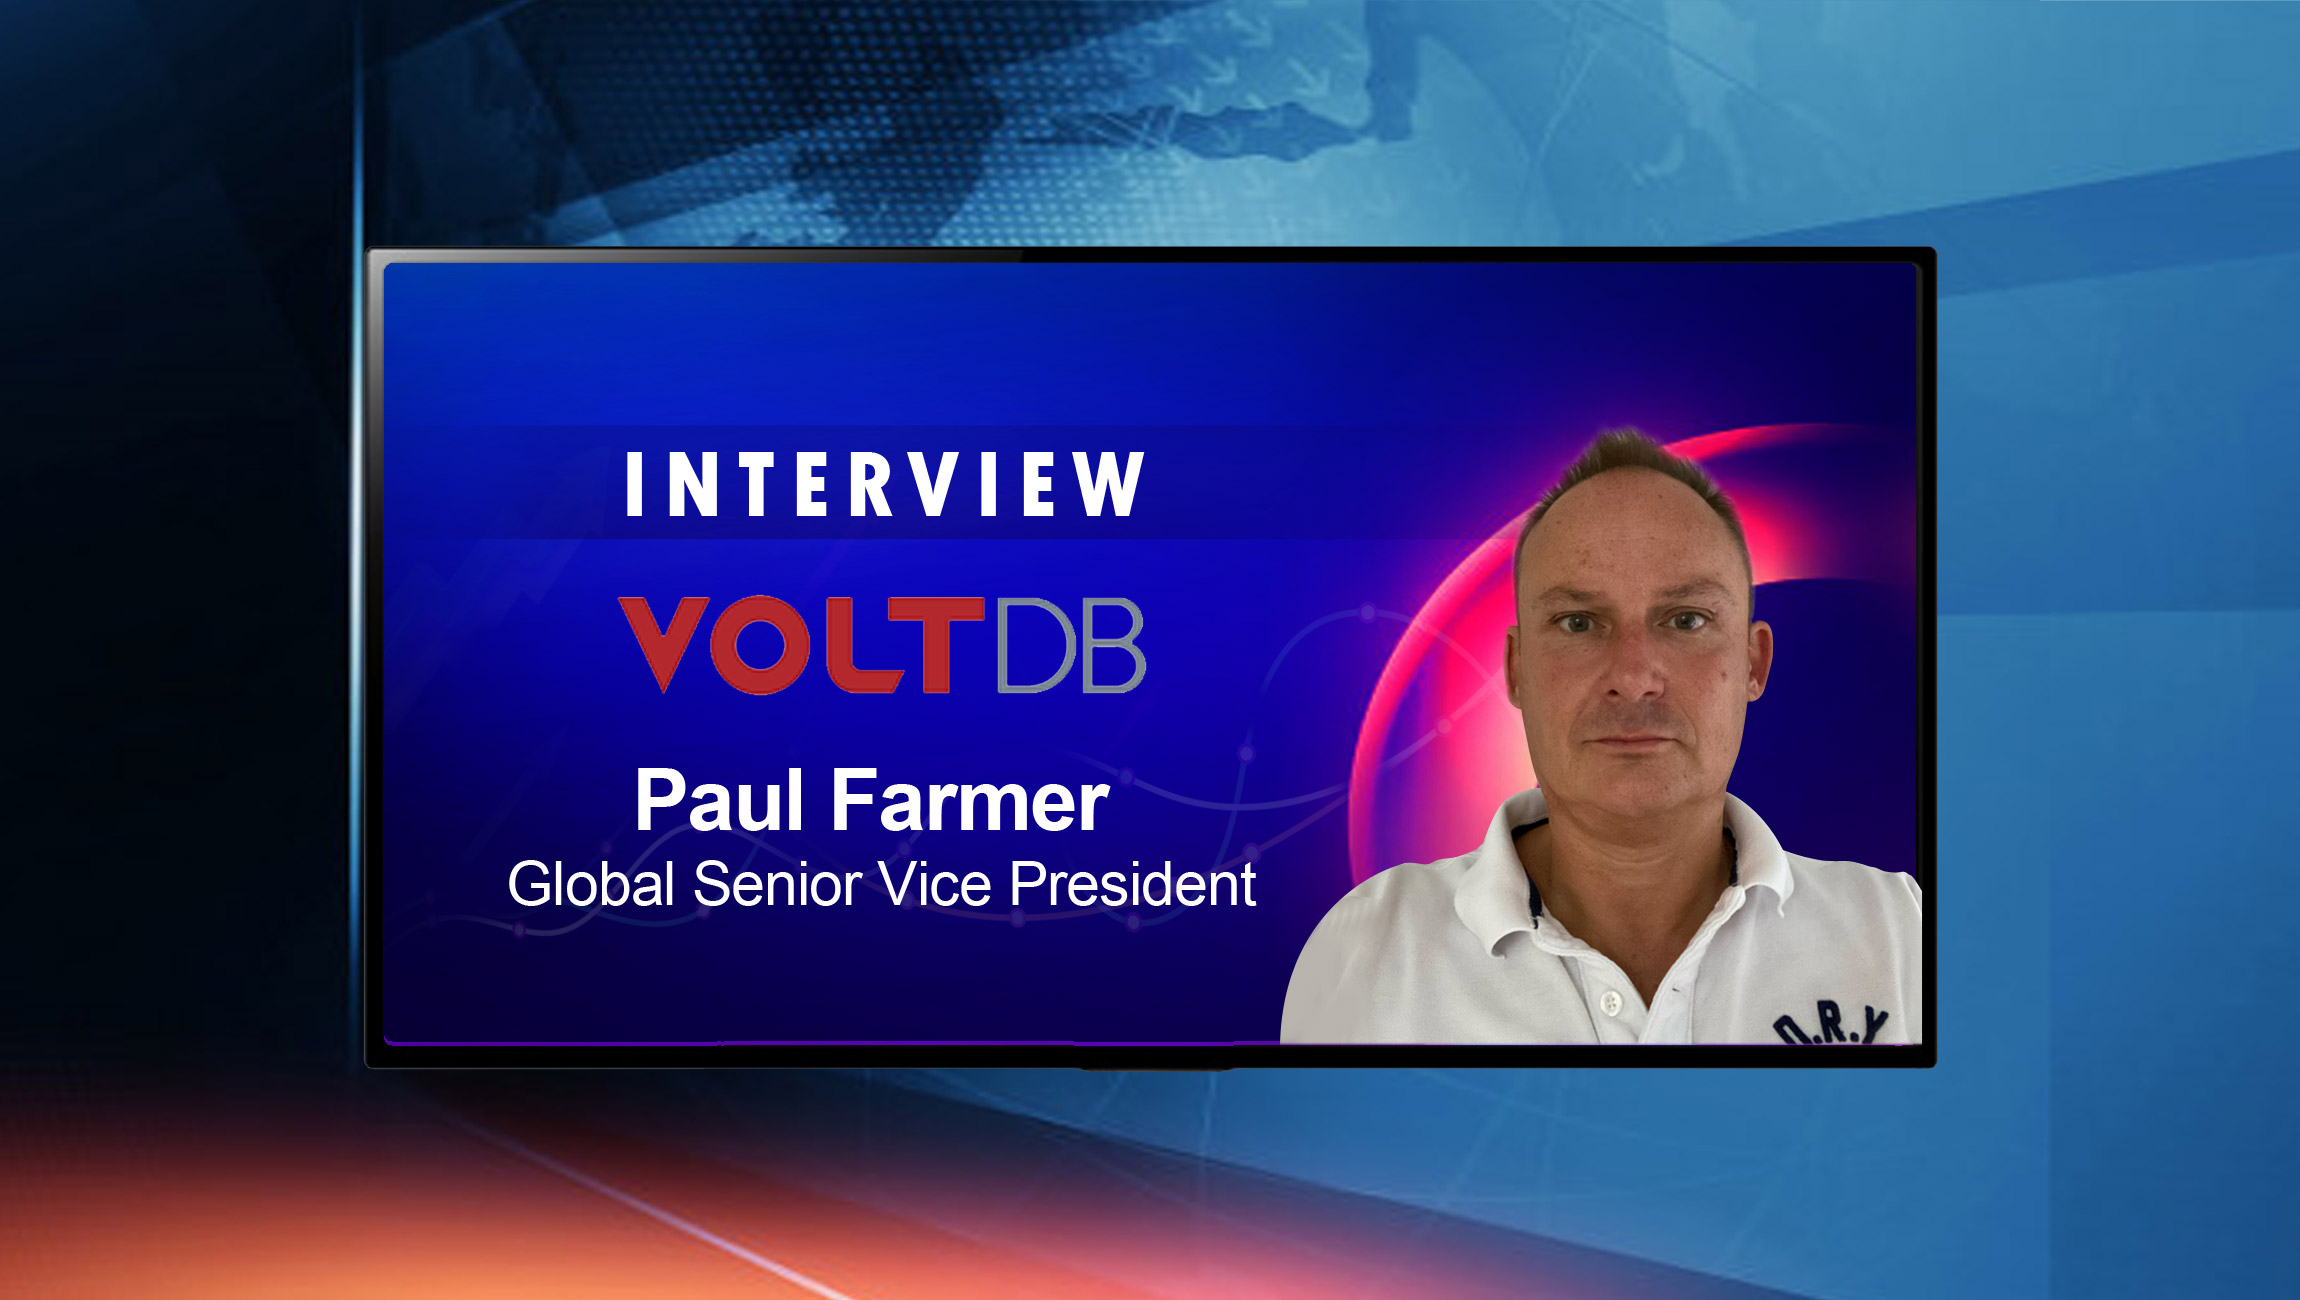 SalesTechStar Interview with Paul Farmer, Global Senior Vice President at VoltDB, Inc.